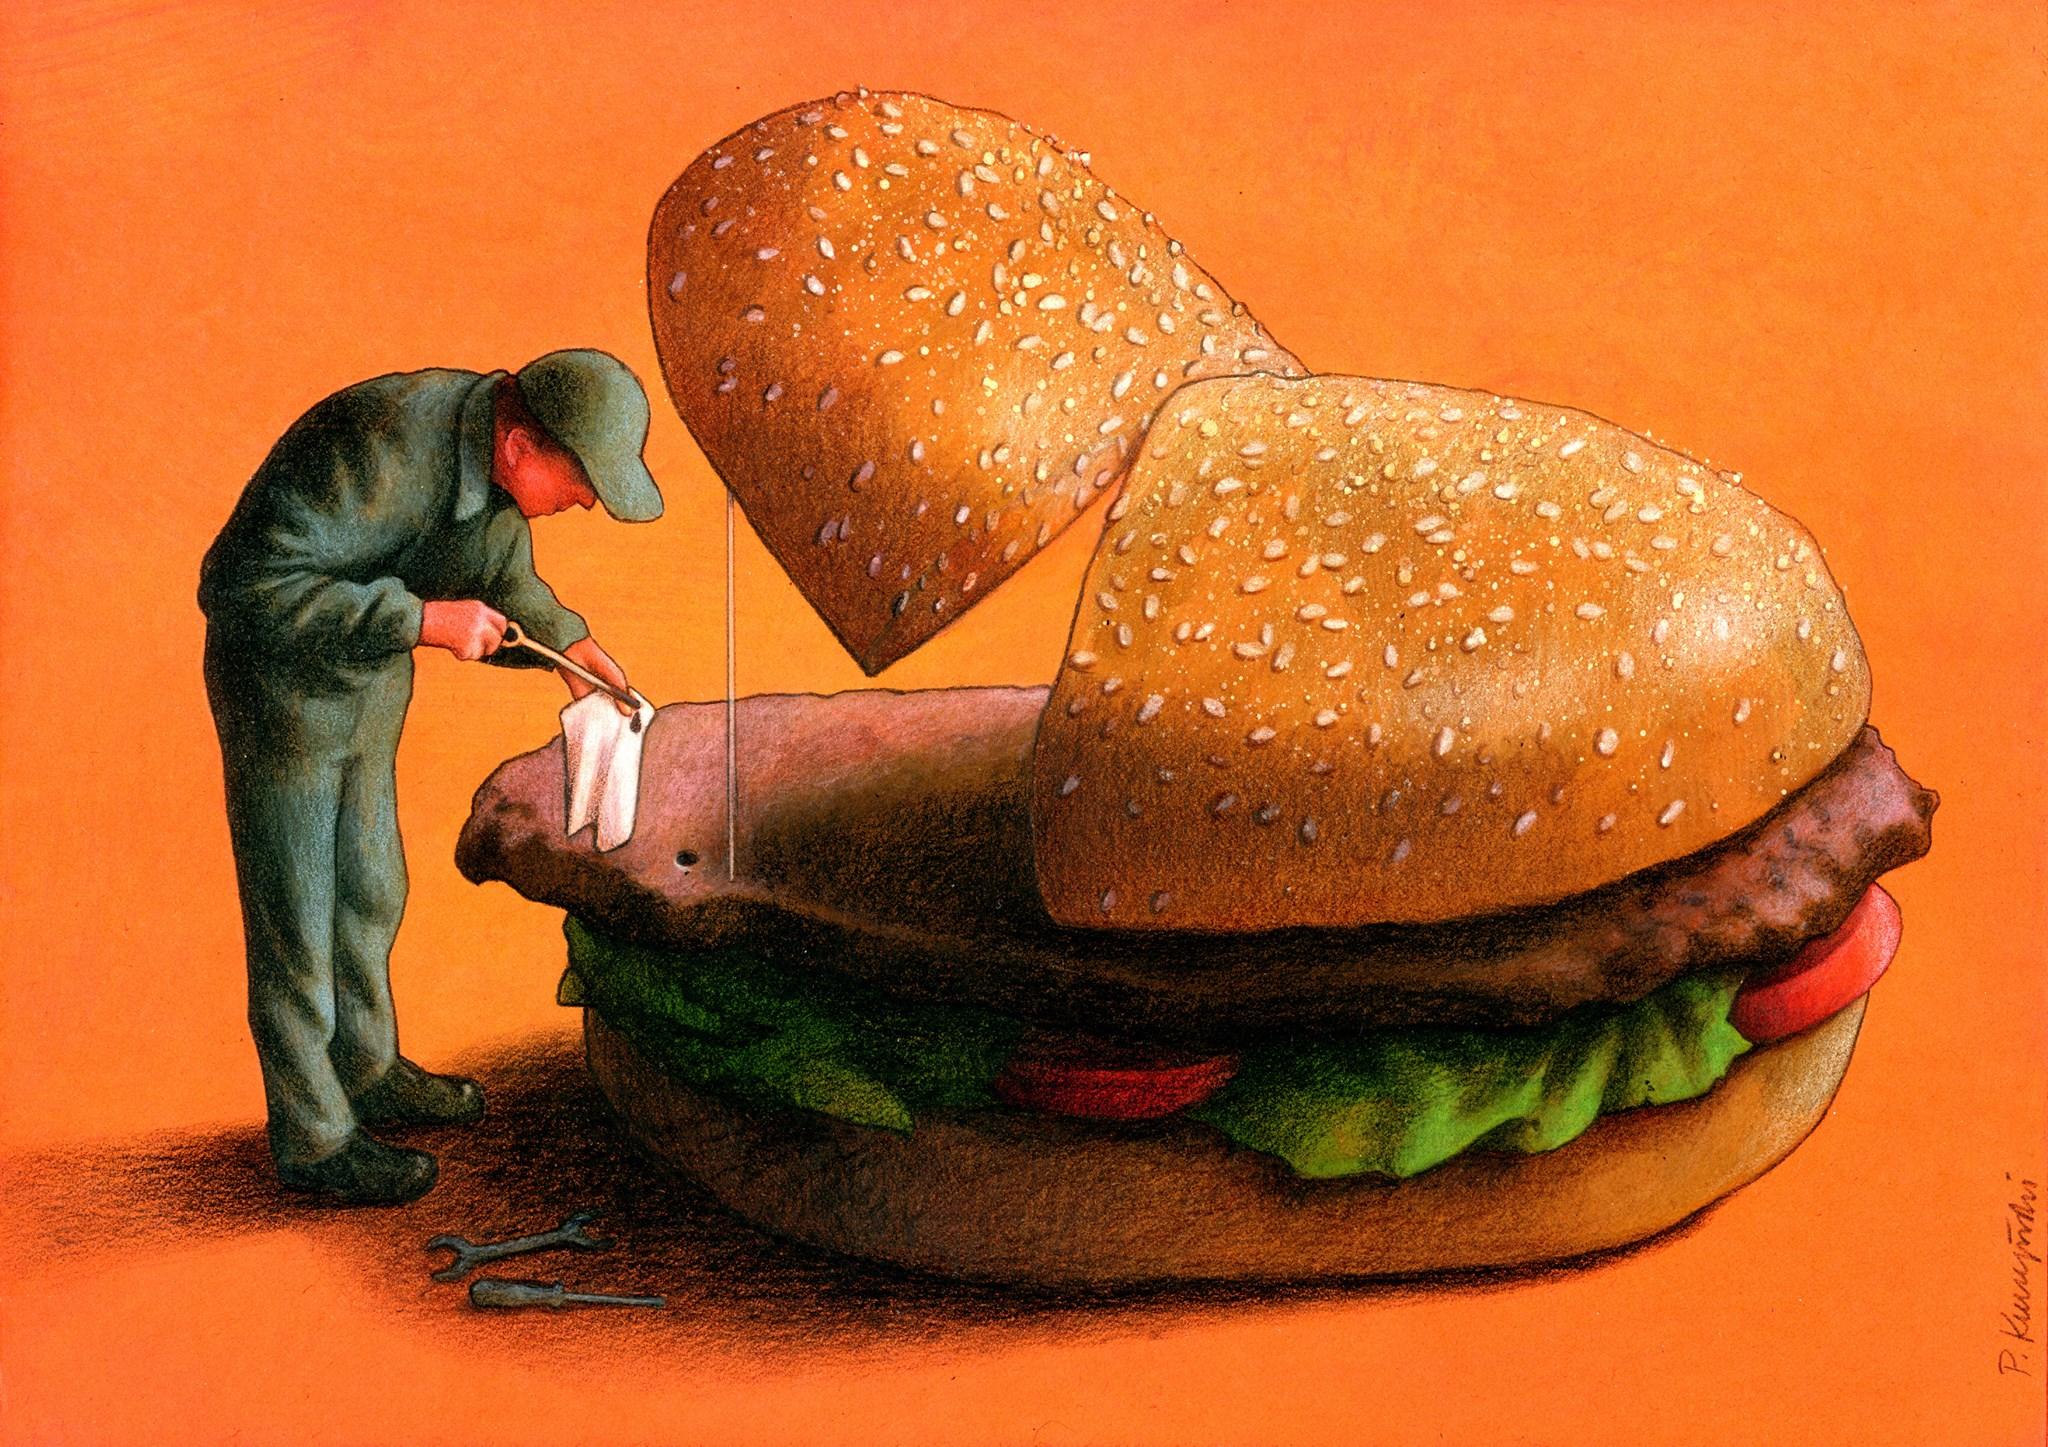 pawel-kuczynski-ilustração-satira-ironia-critica-social-36